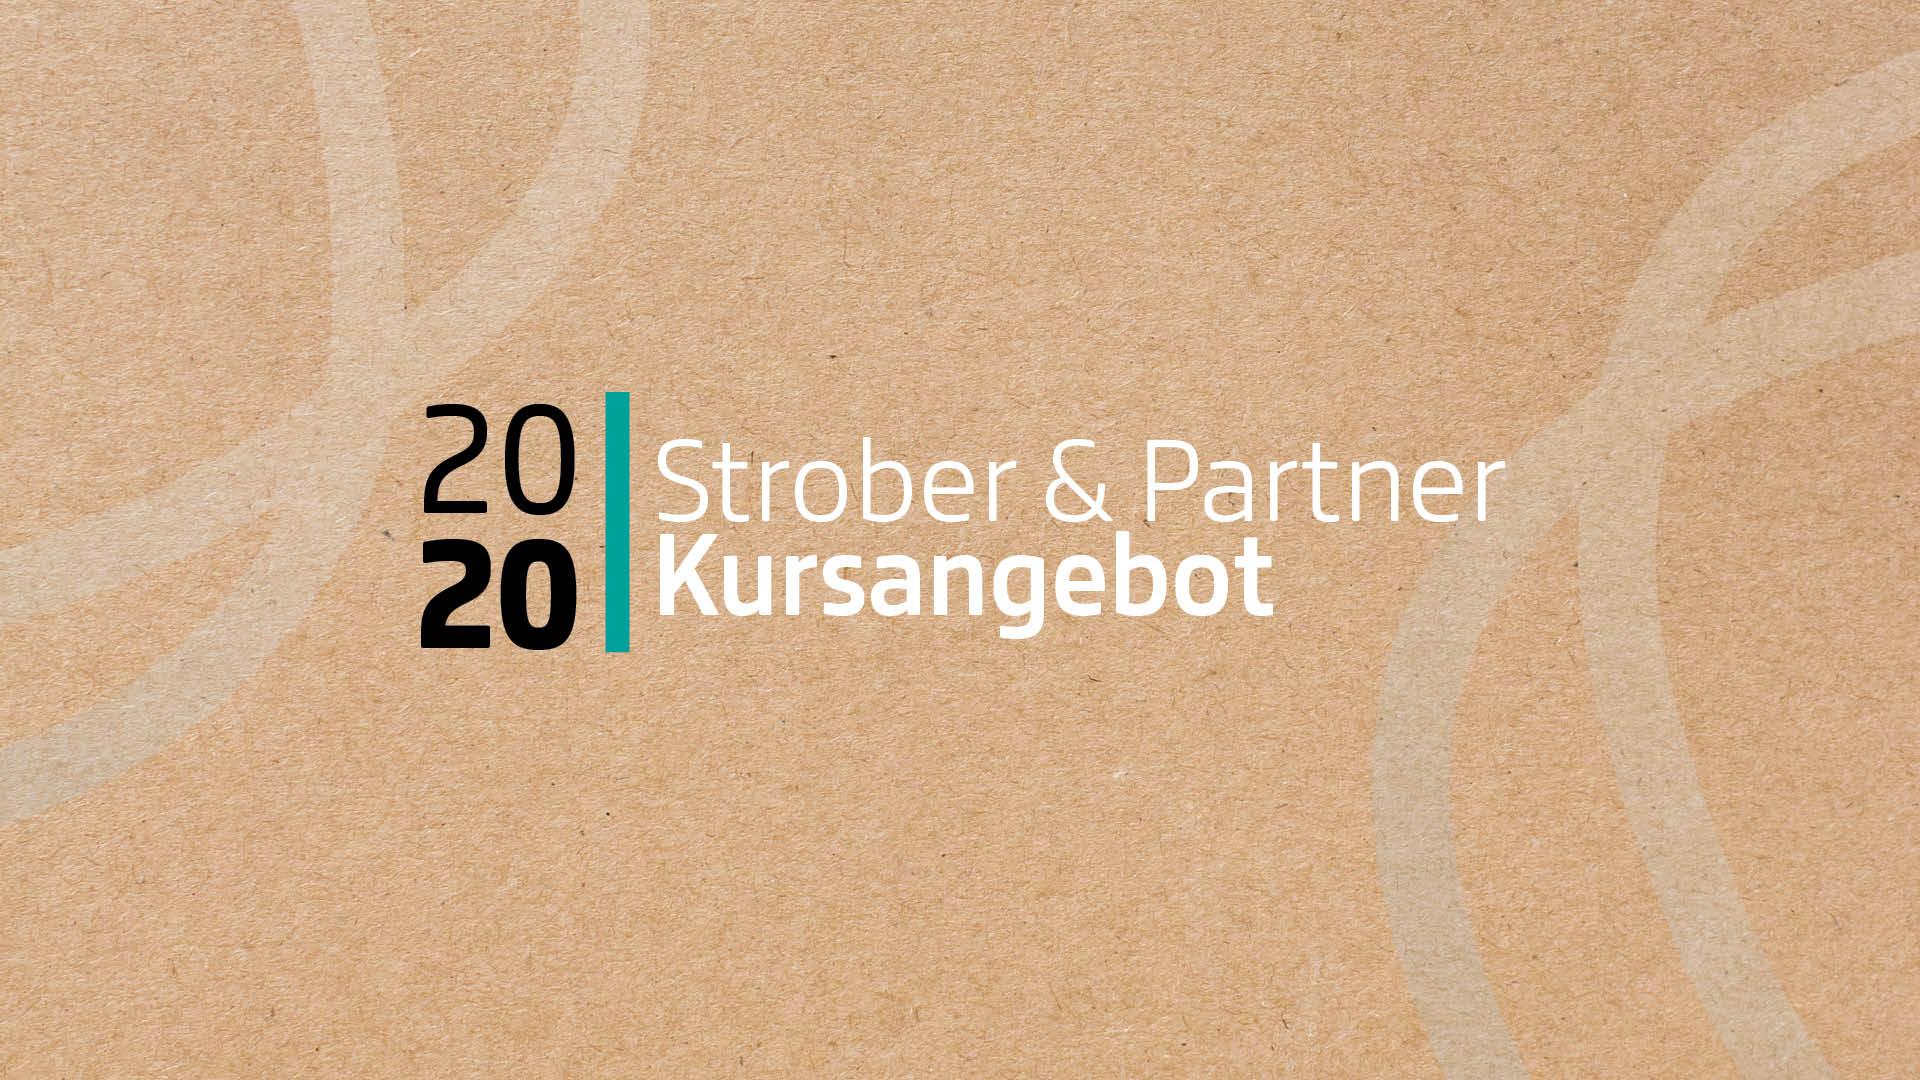 Strober & Partner